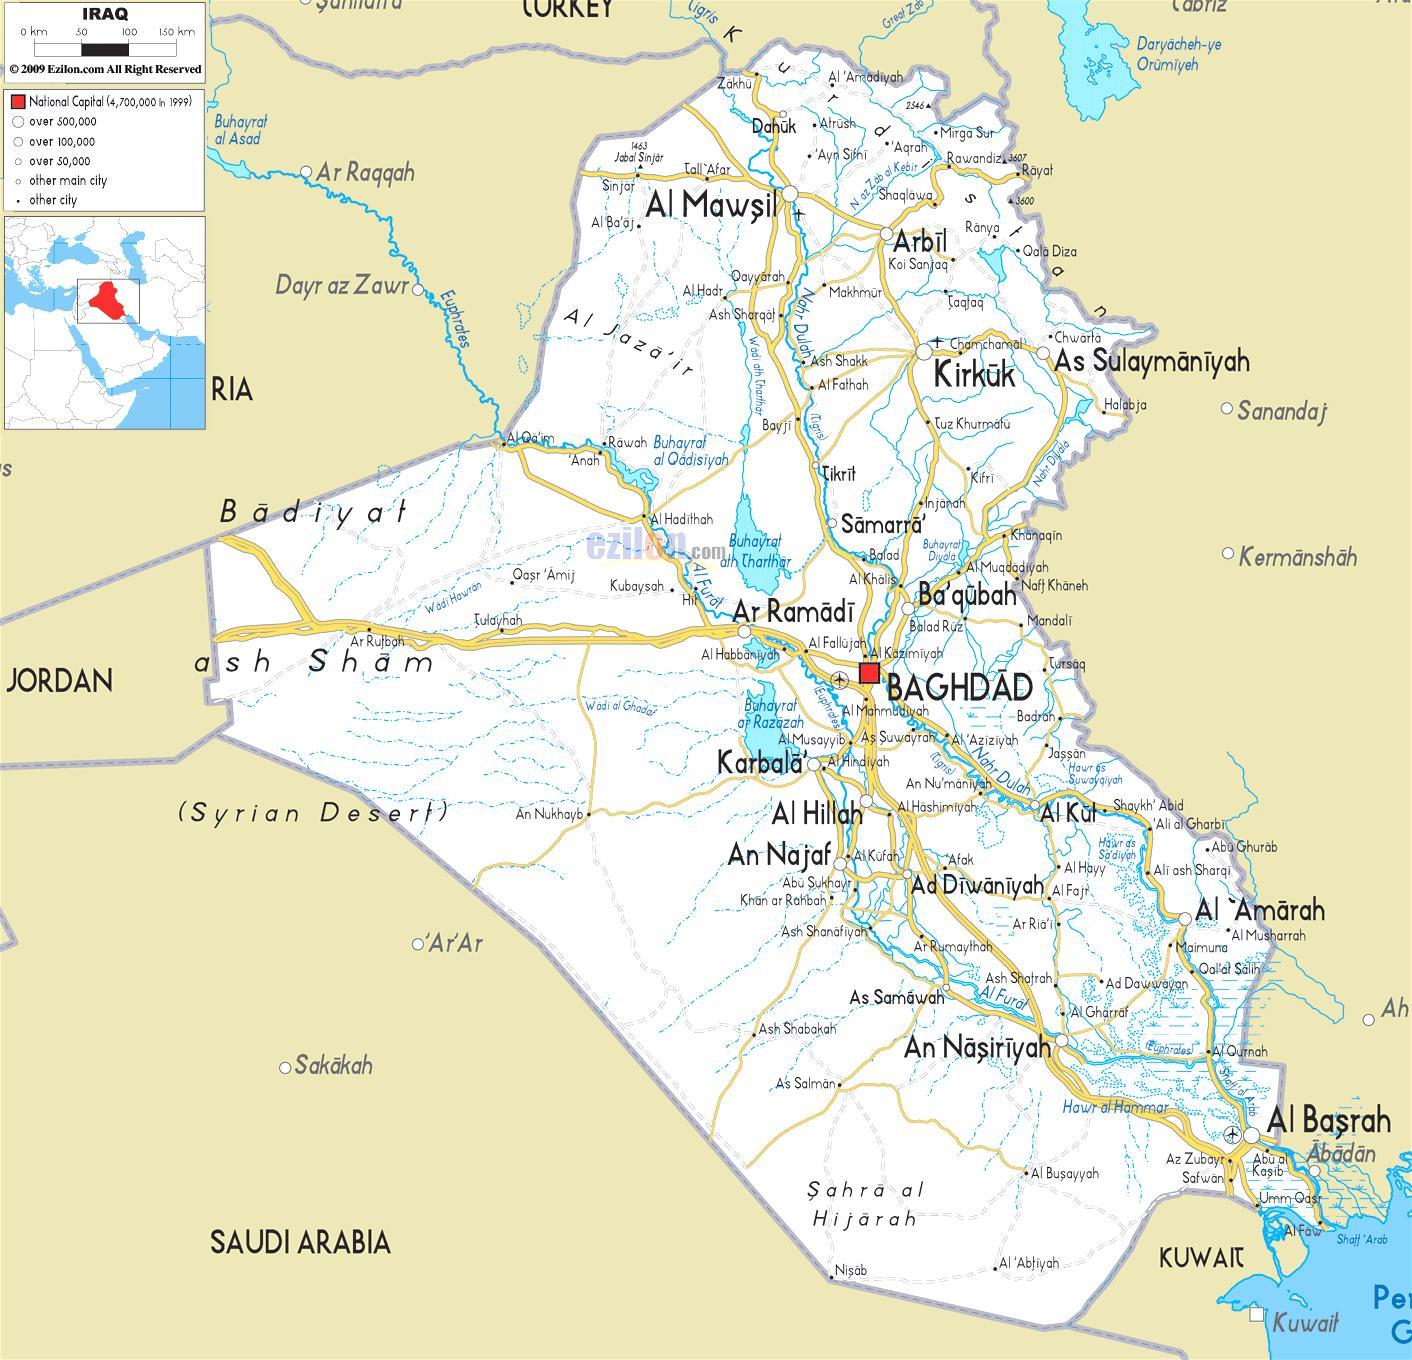 Irak Reky Mapa Mapa Iraku Reky Zapadni Asie Asie